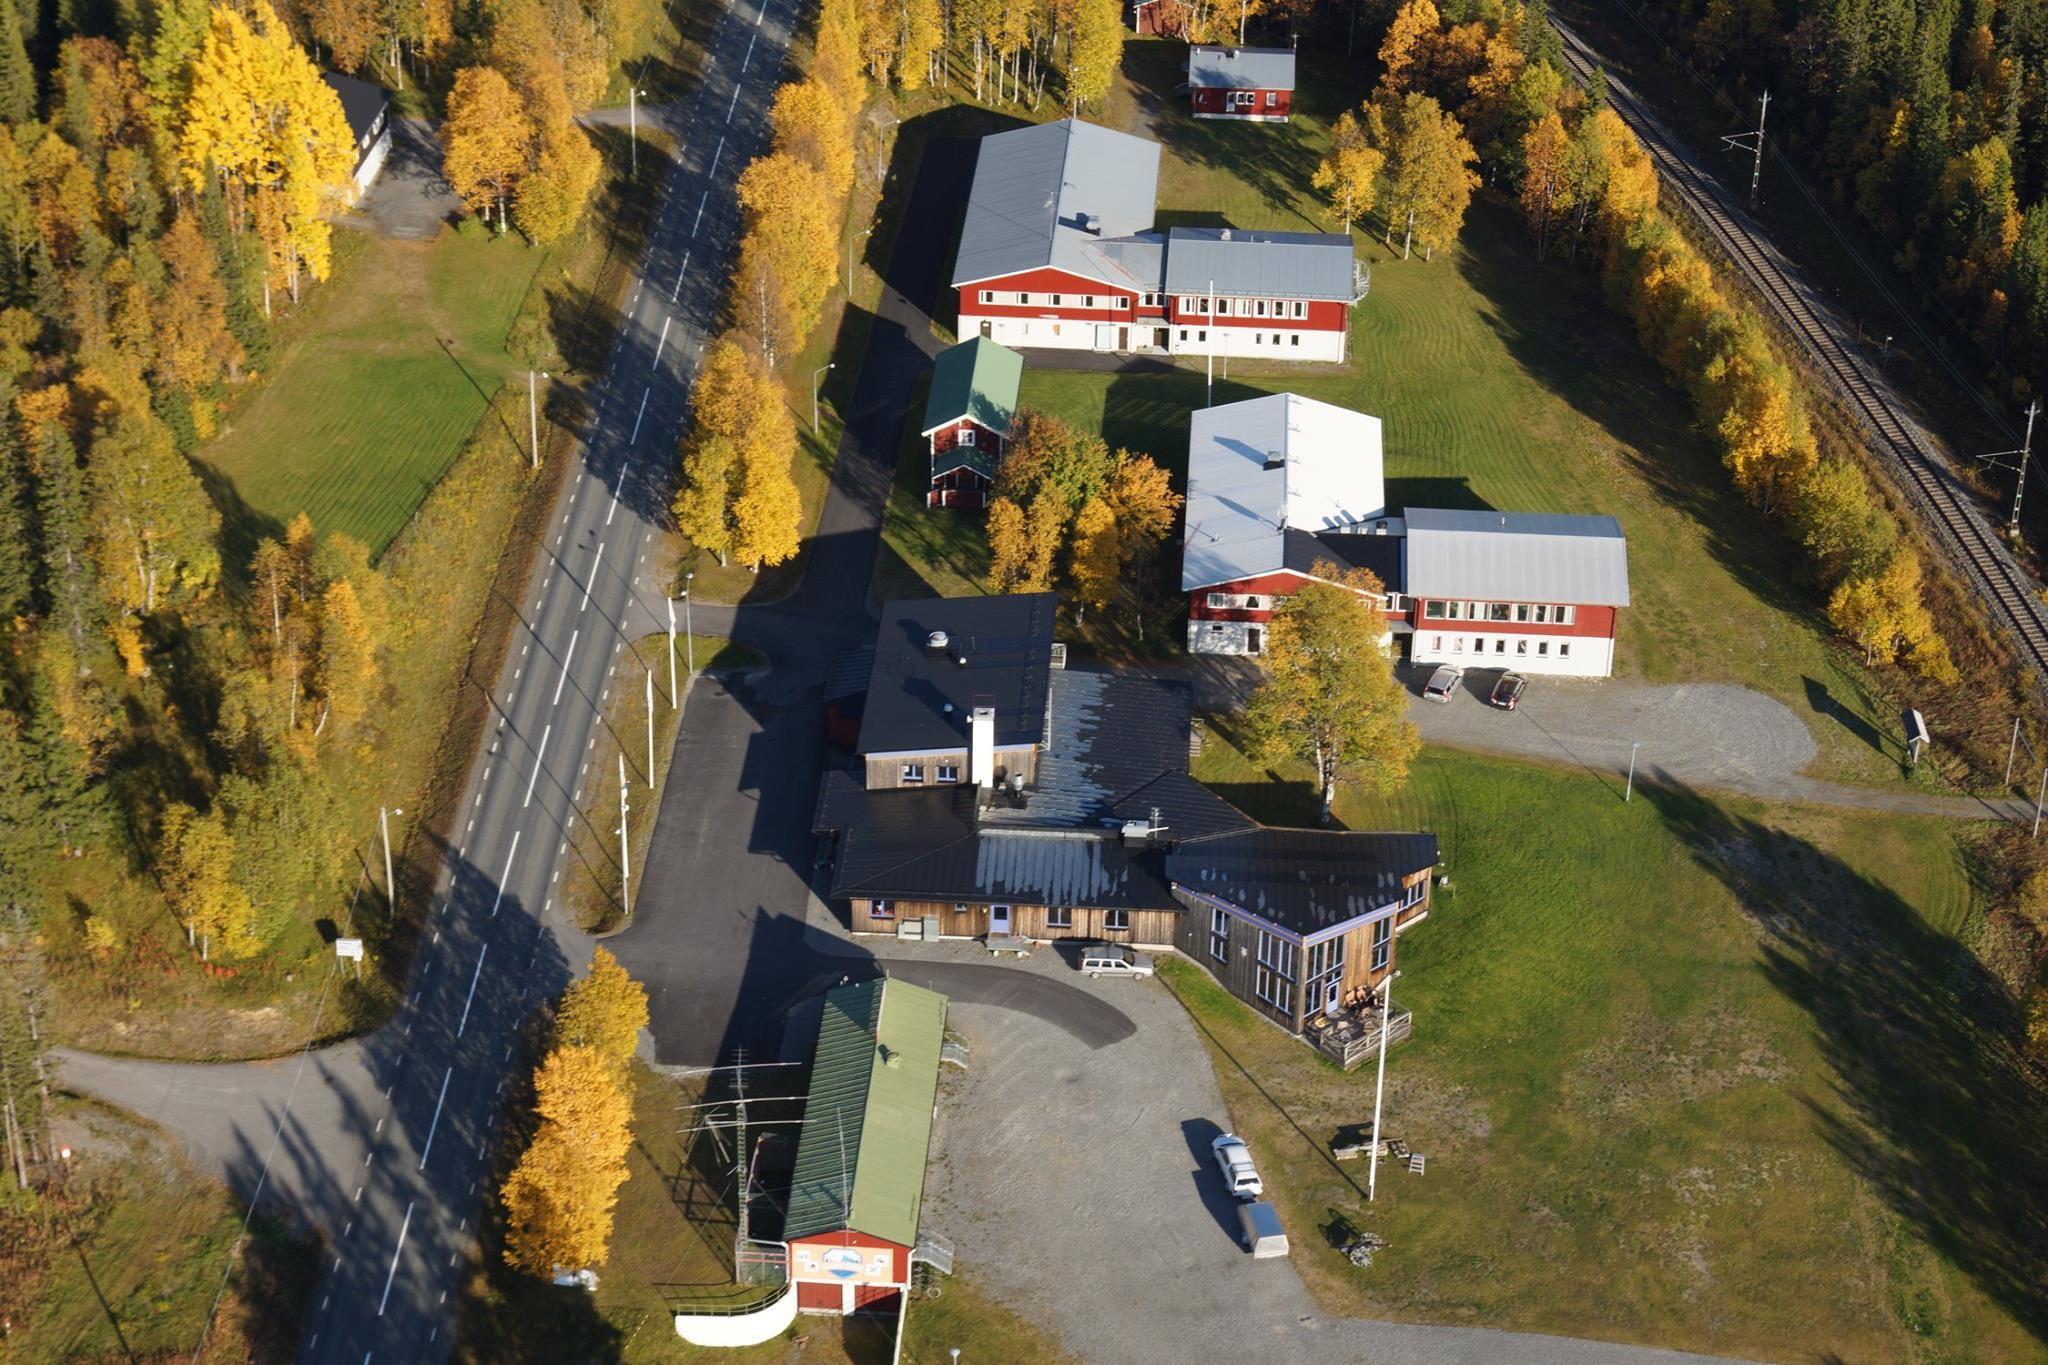 Camp Ånns hotellrum